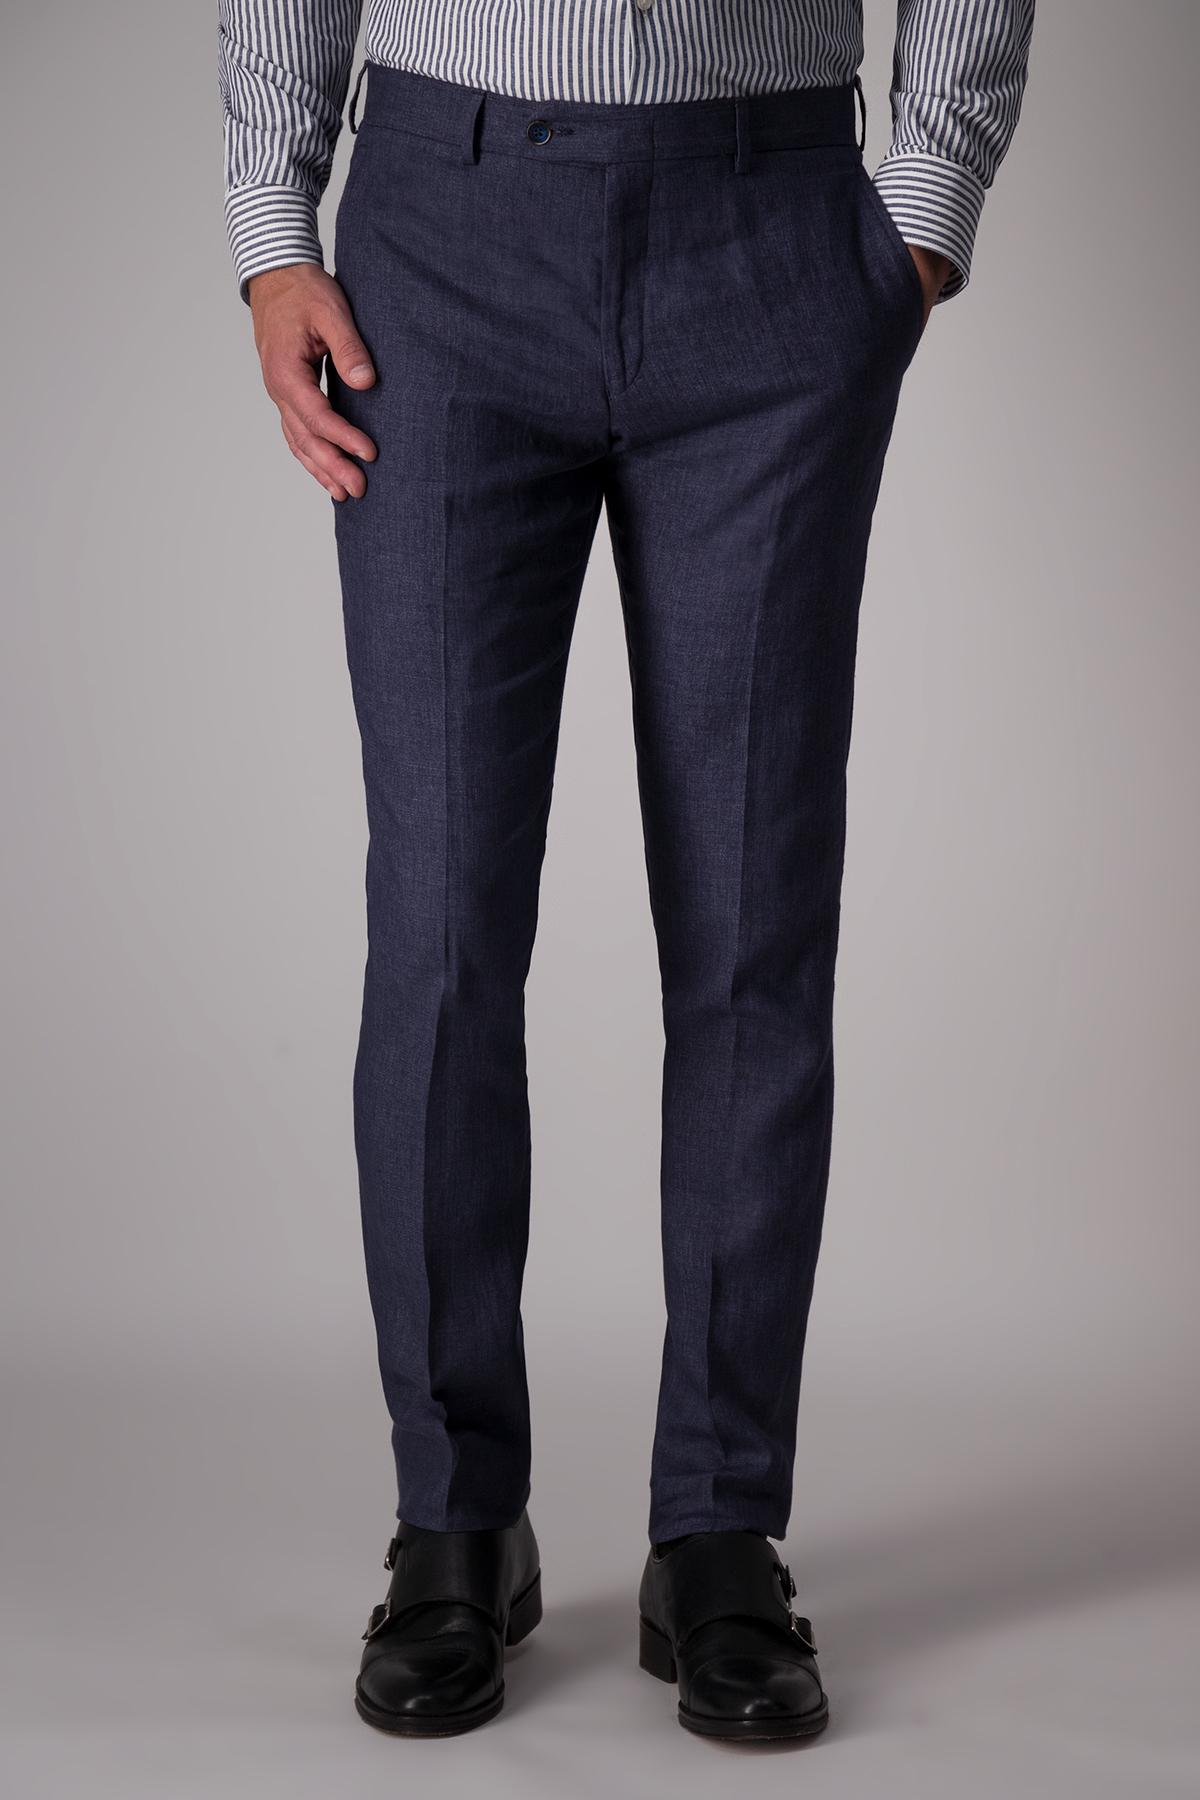 Pantalón Calderoni tela italiana, 100% lino color azul.